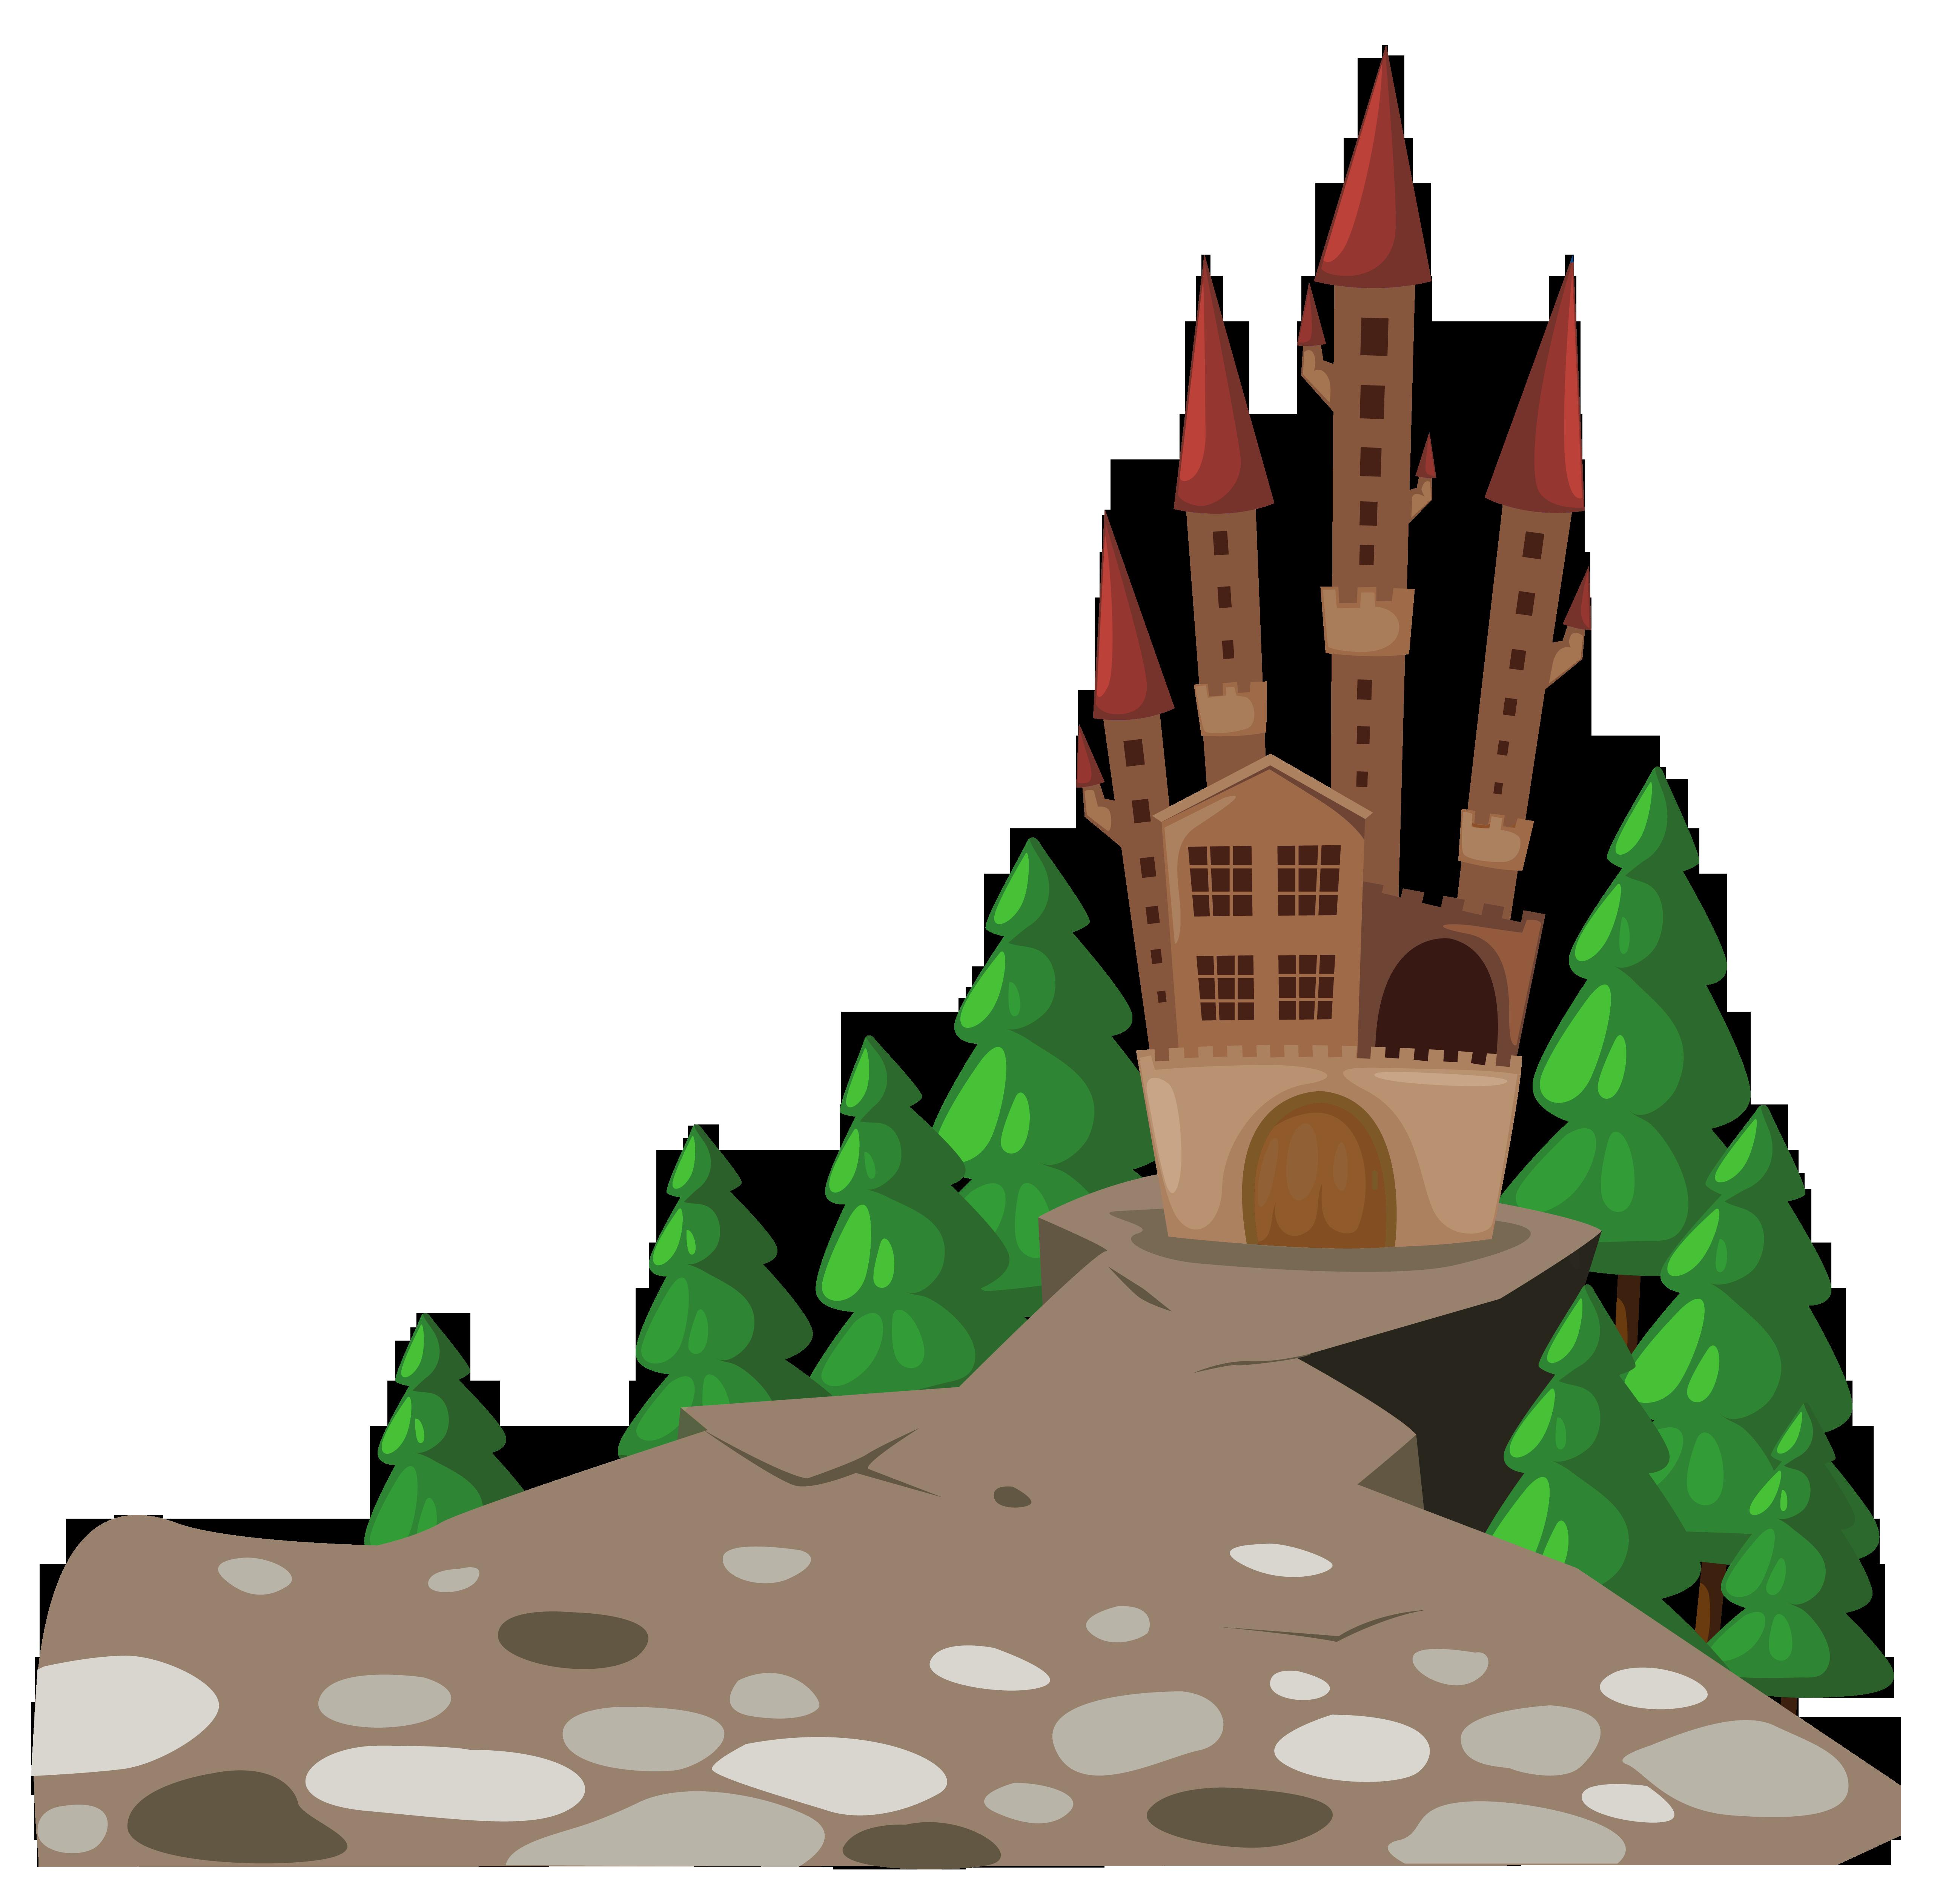 Mosque clipart cartoon. Transparent castle and pines